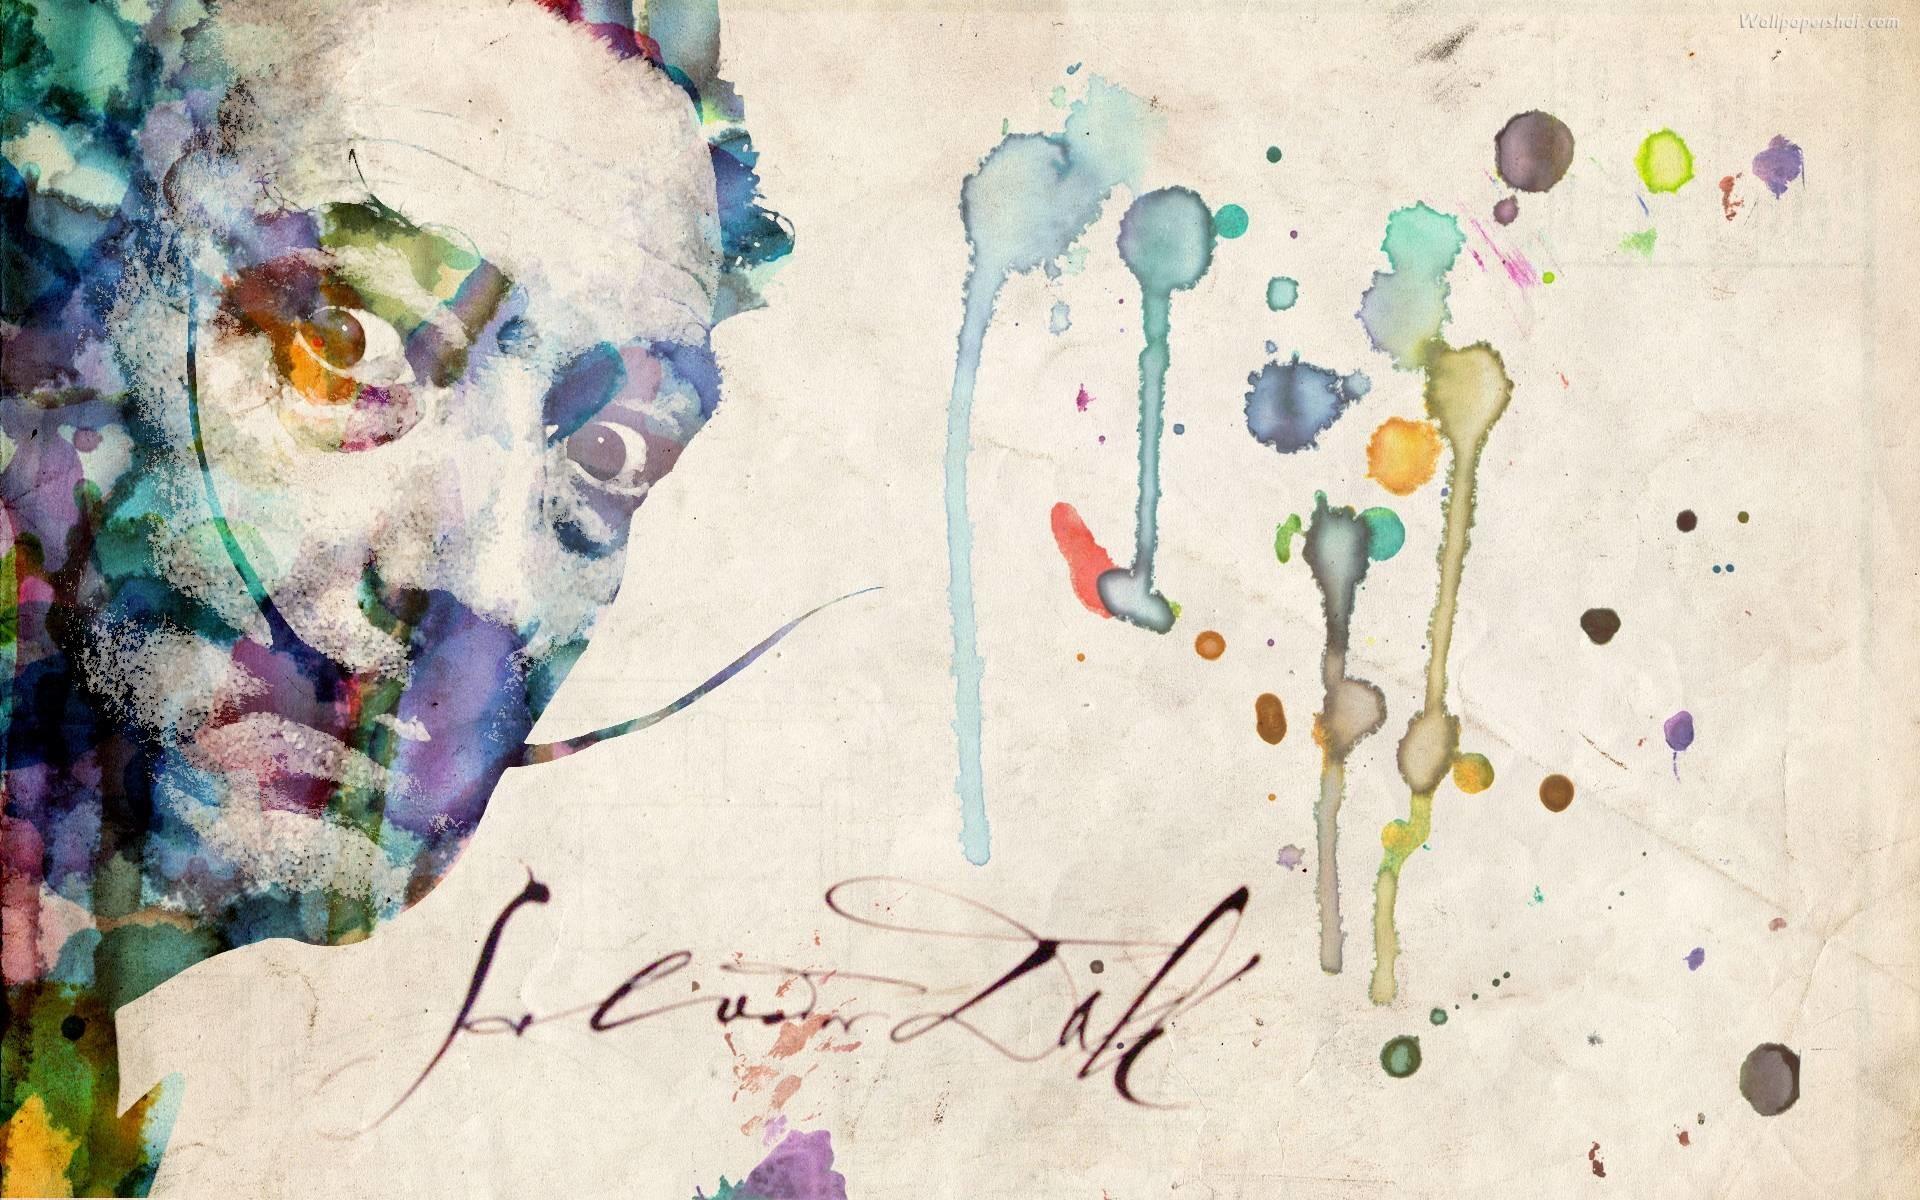 Wallpapers For > Salvador Dali Wallpaper Widescreen